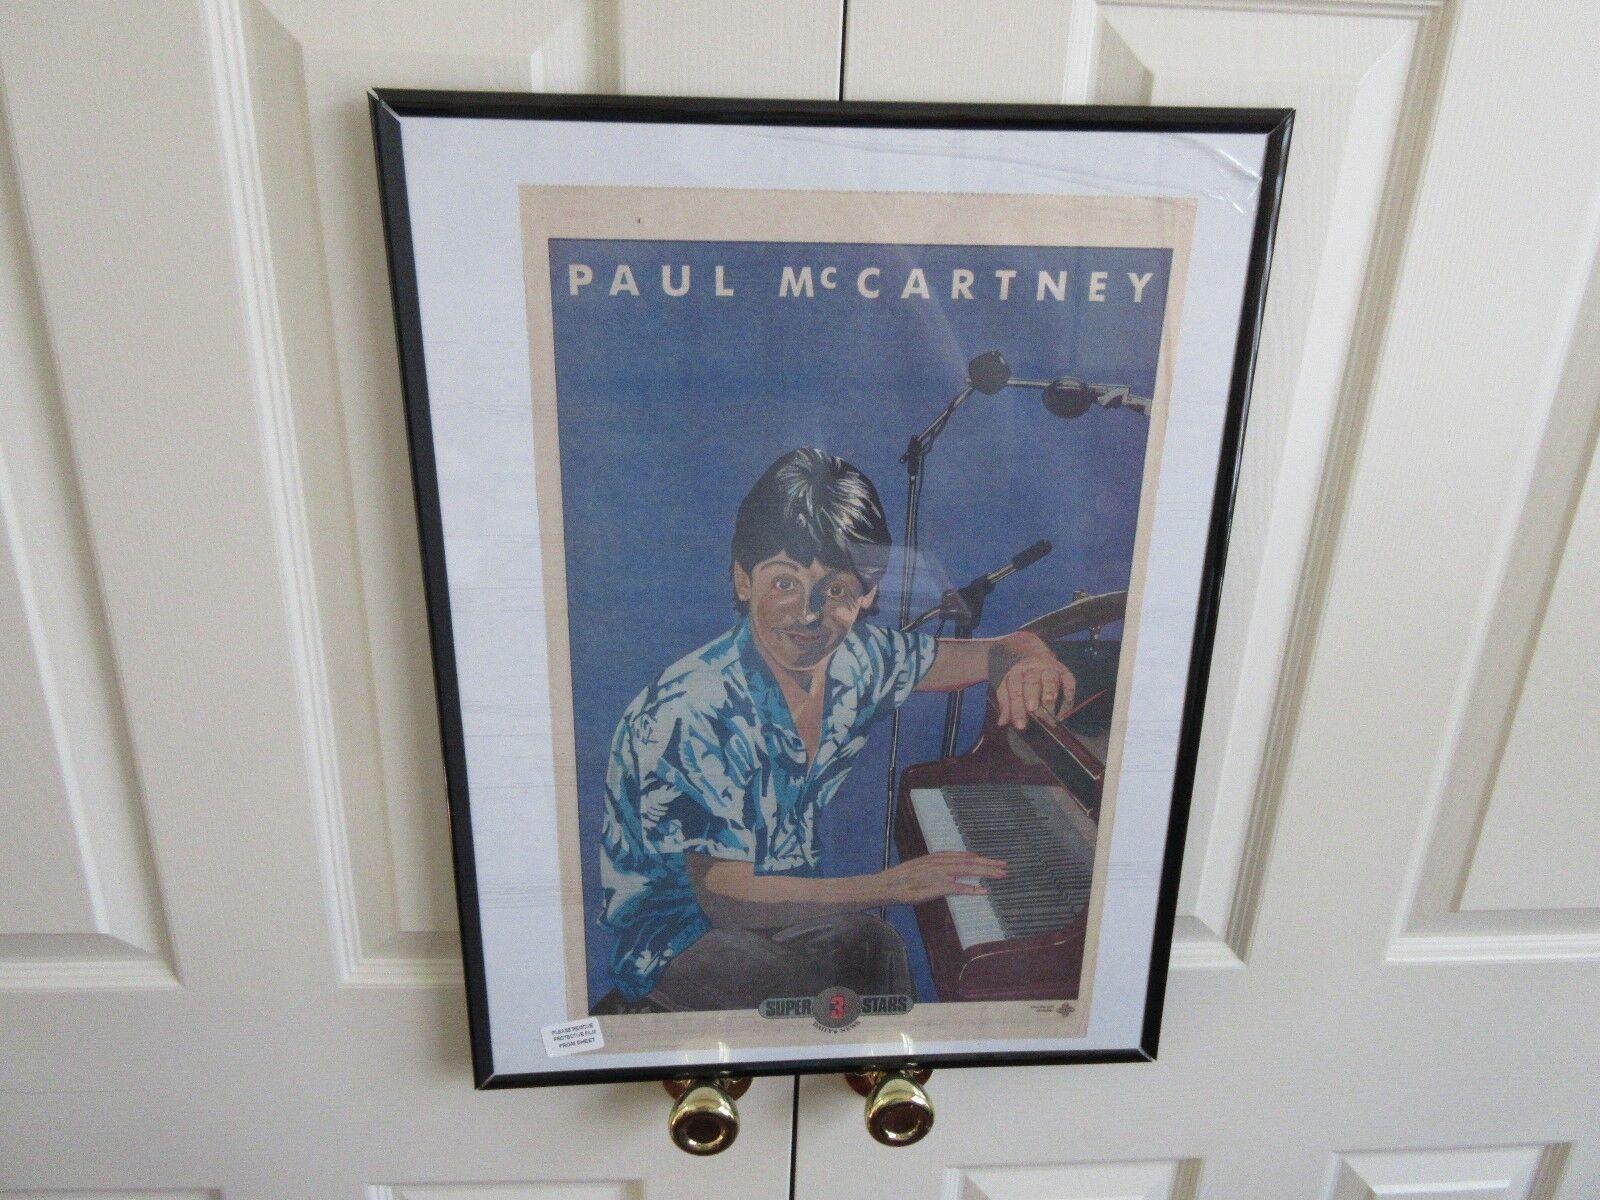 Paul McCartney , New York Daily News , SUPERSTAR #3 ,